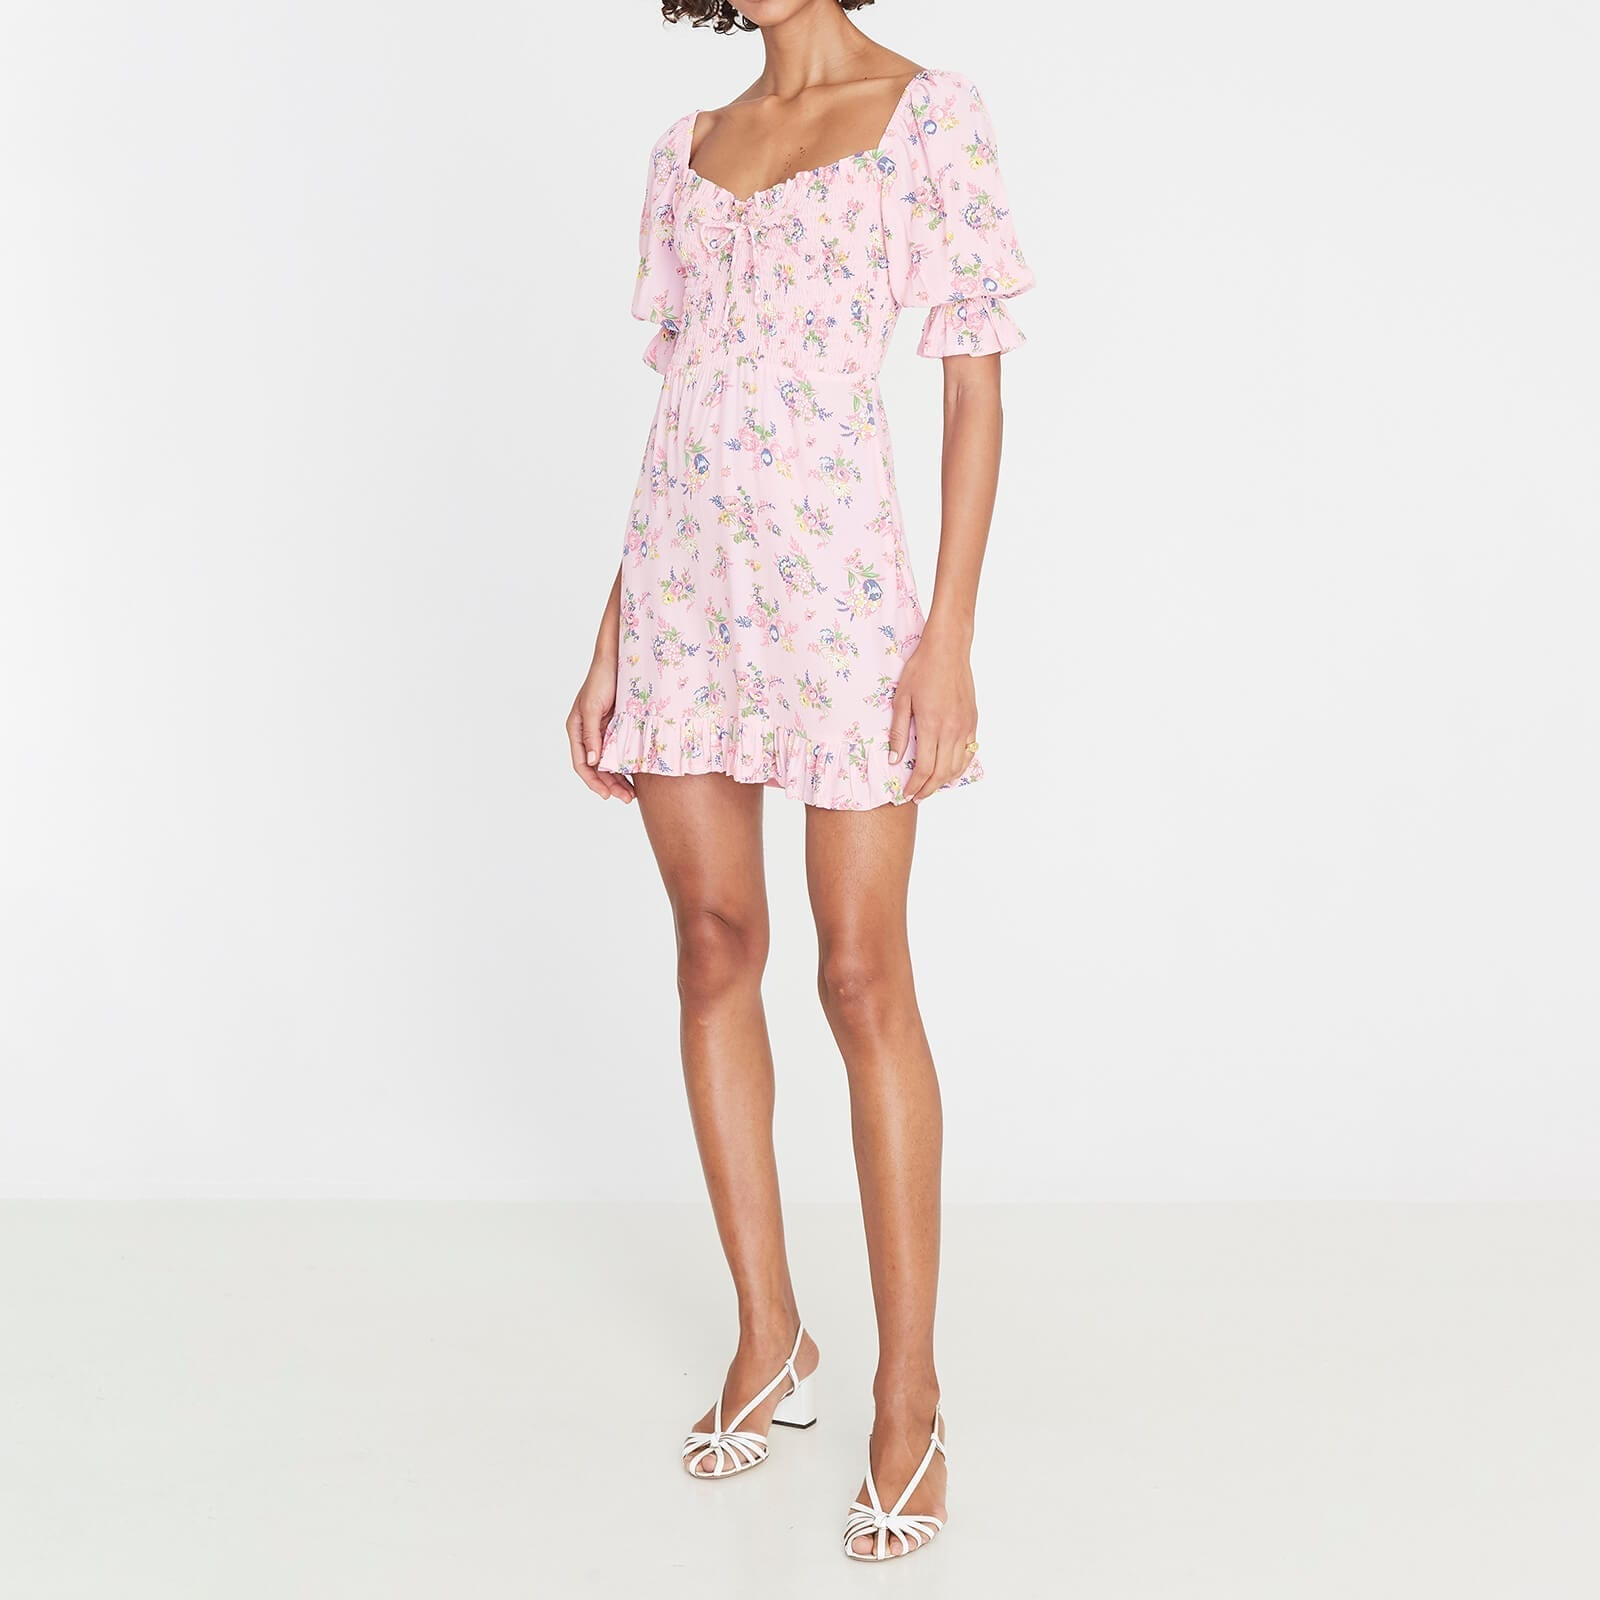 FAITHFULL THE BRAND Women's Sage Mini Dress